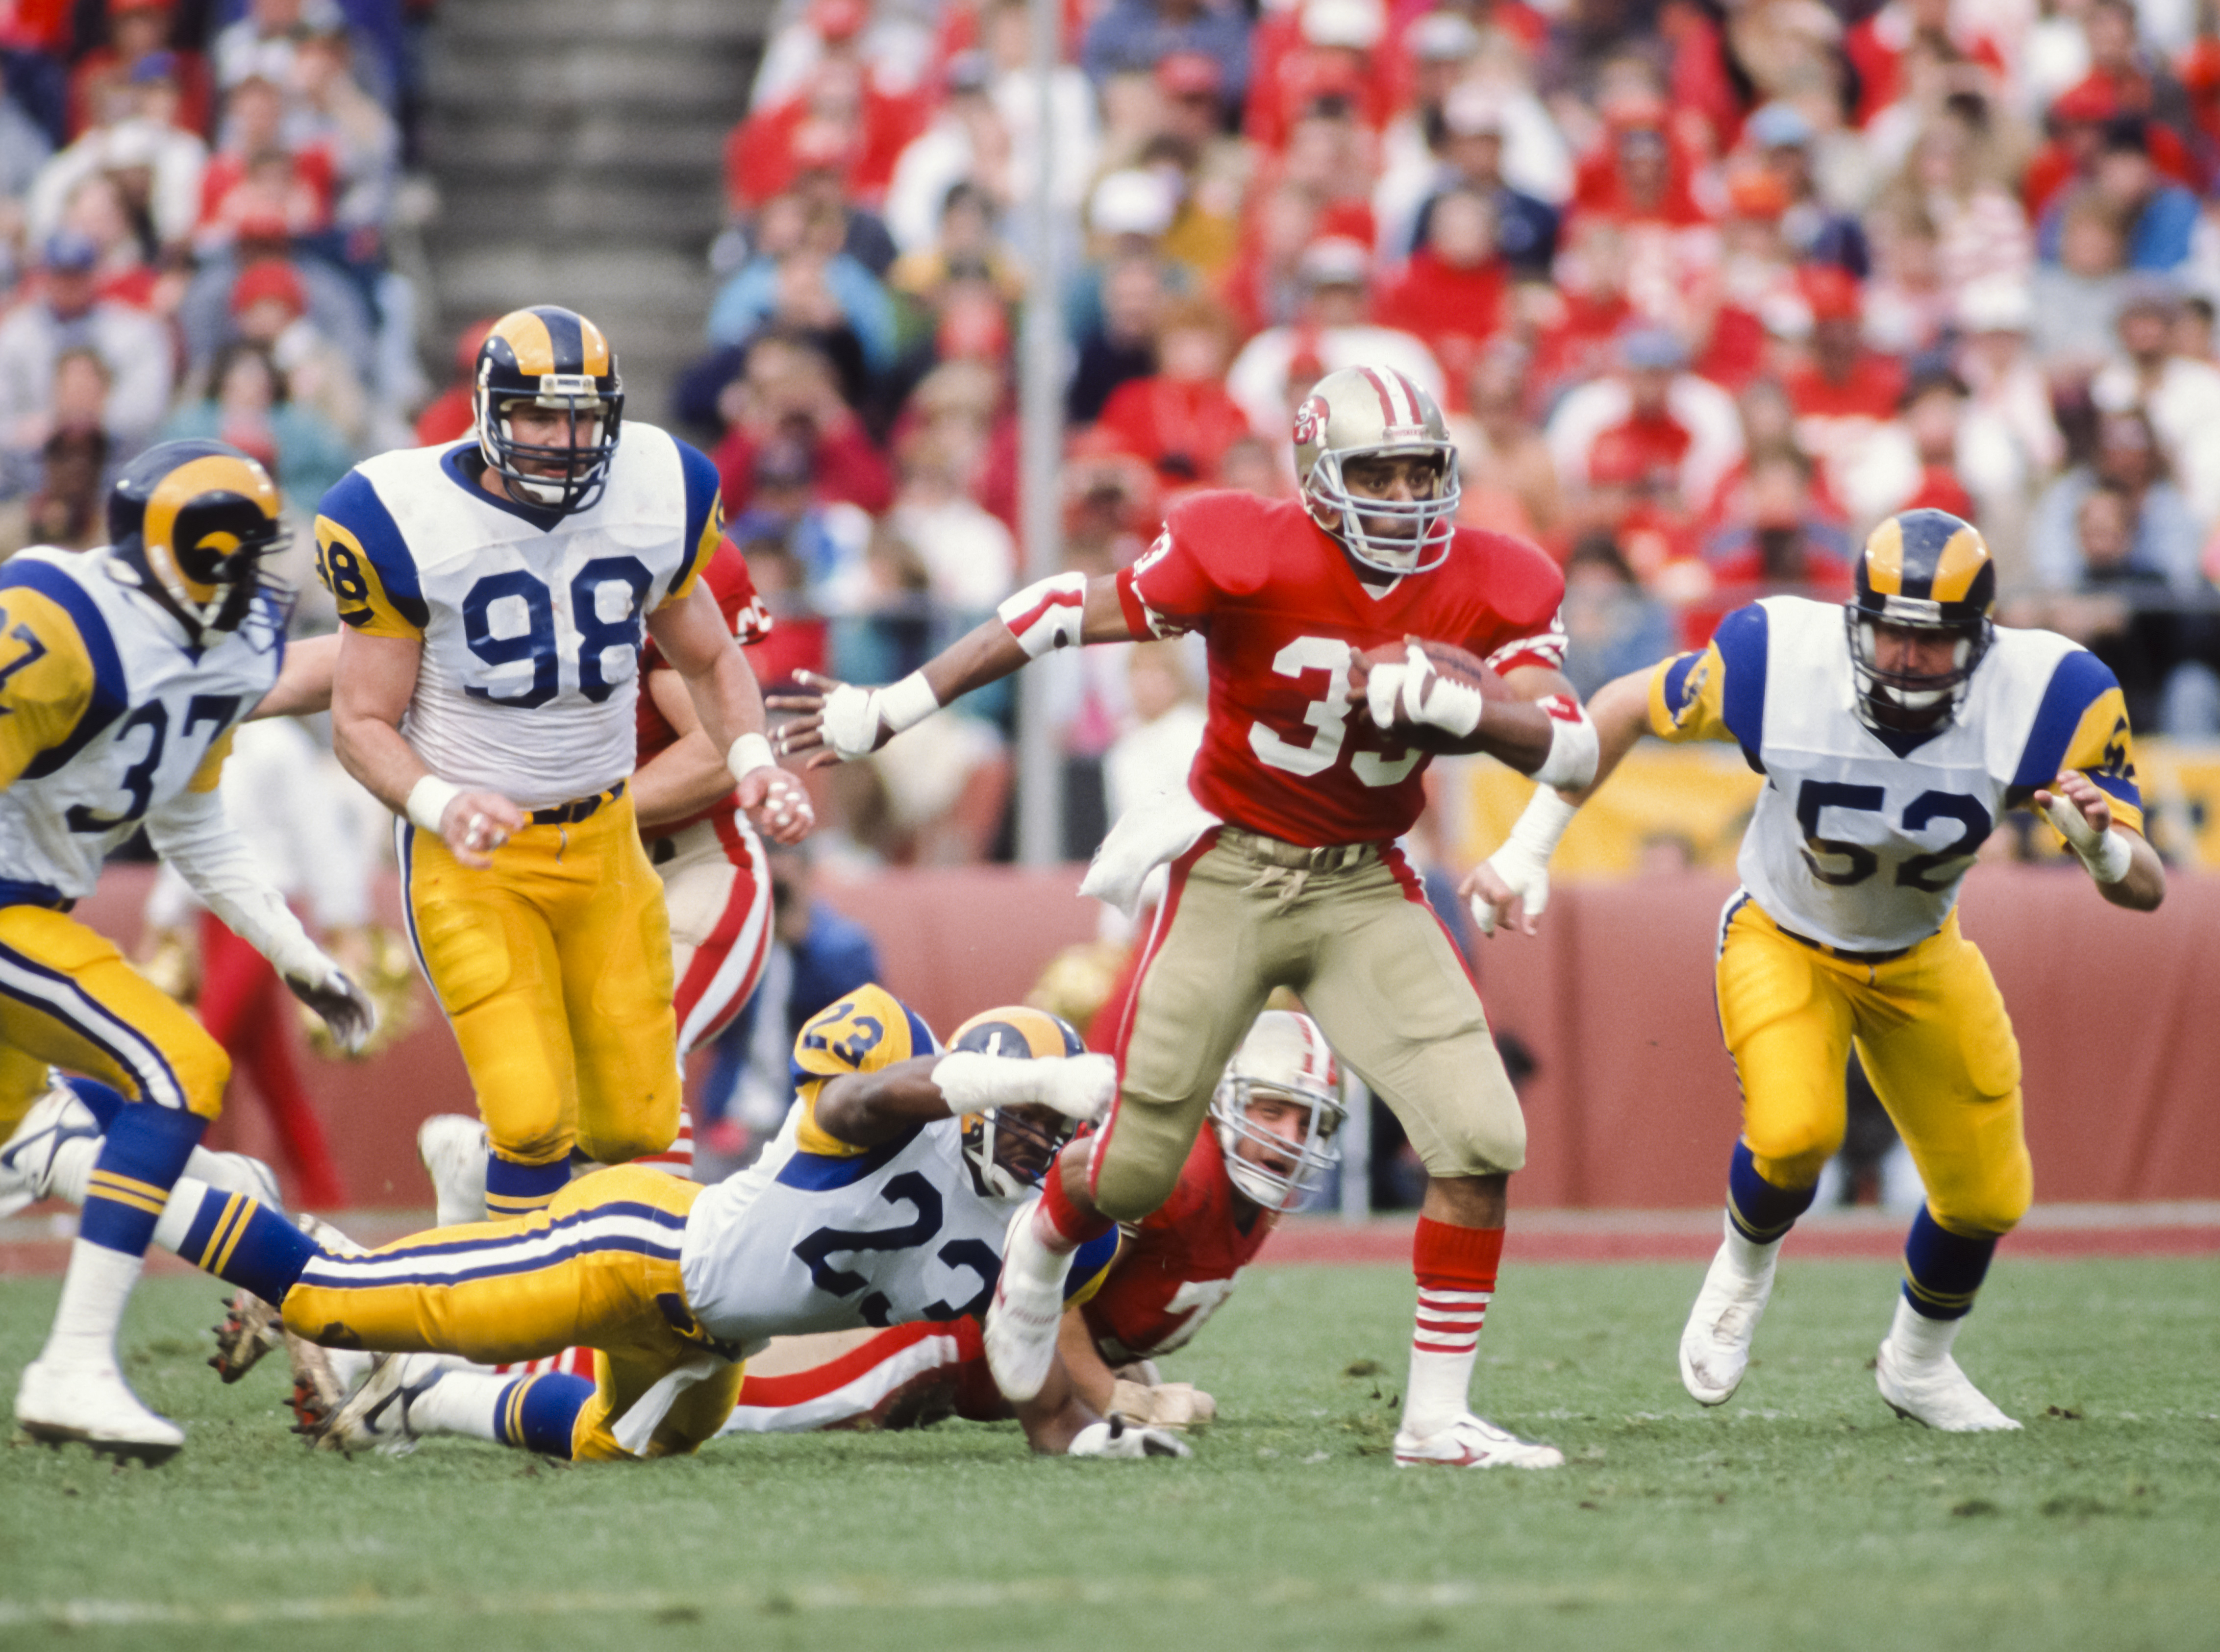 1989 NFC Championship